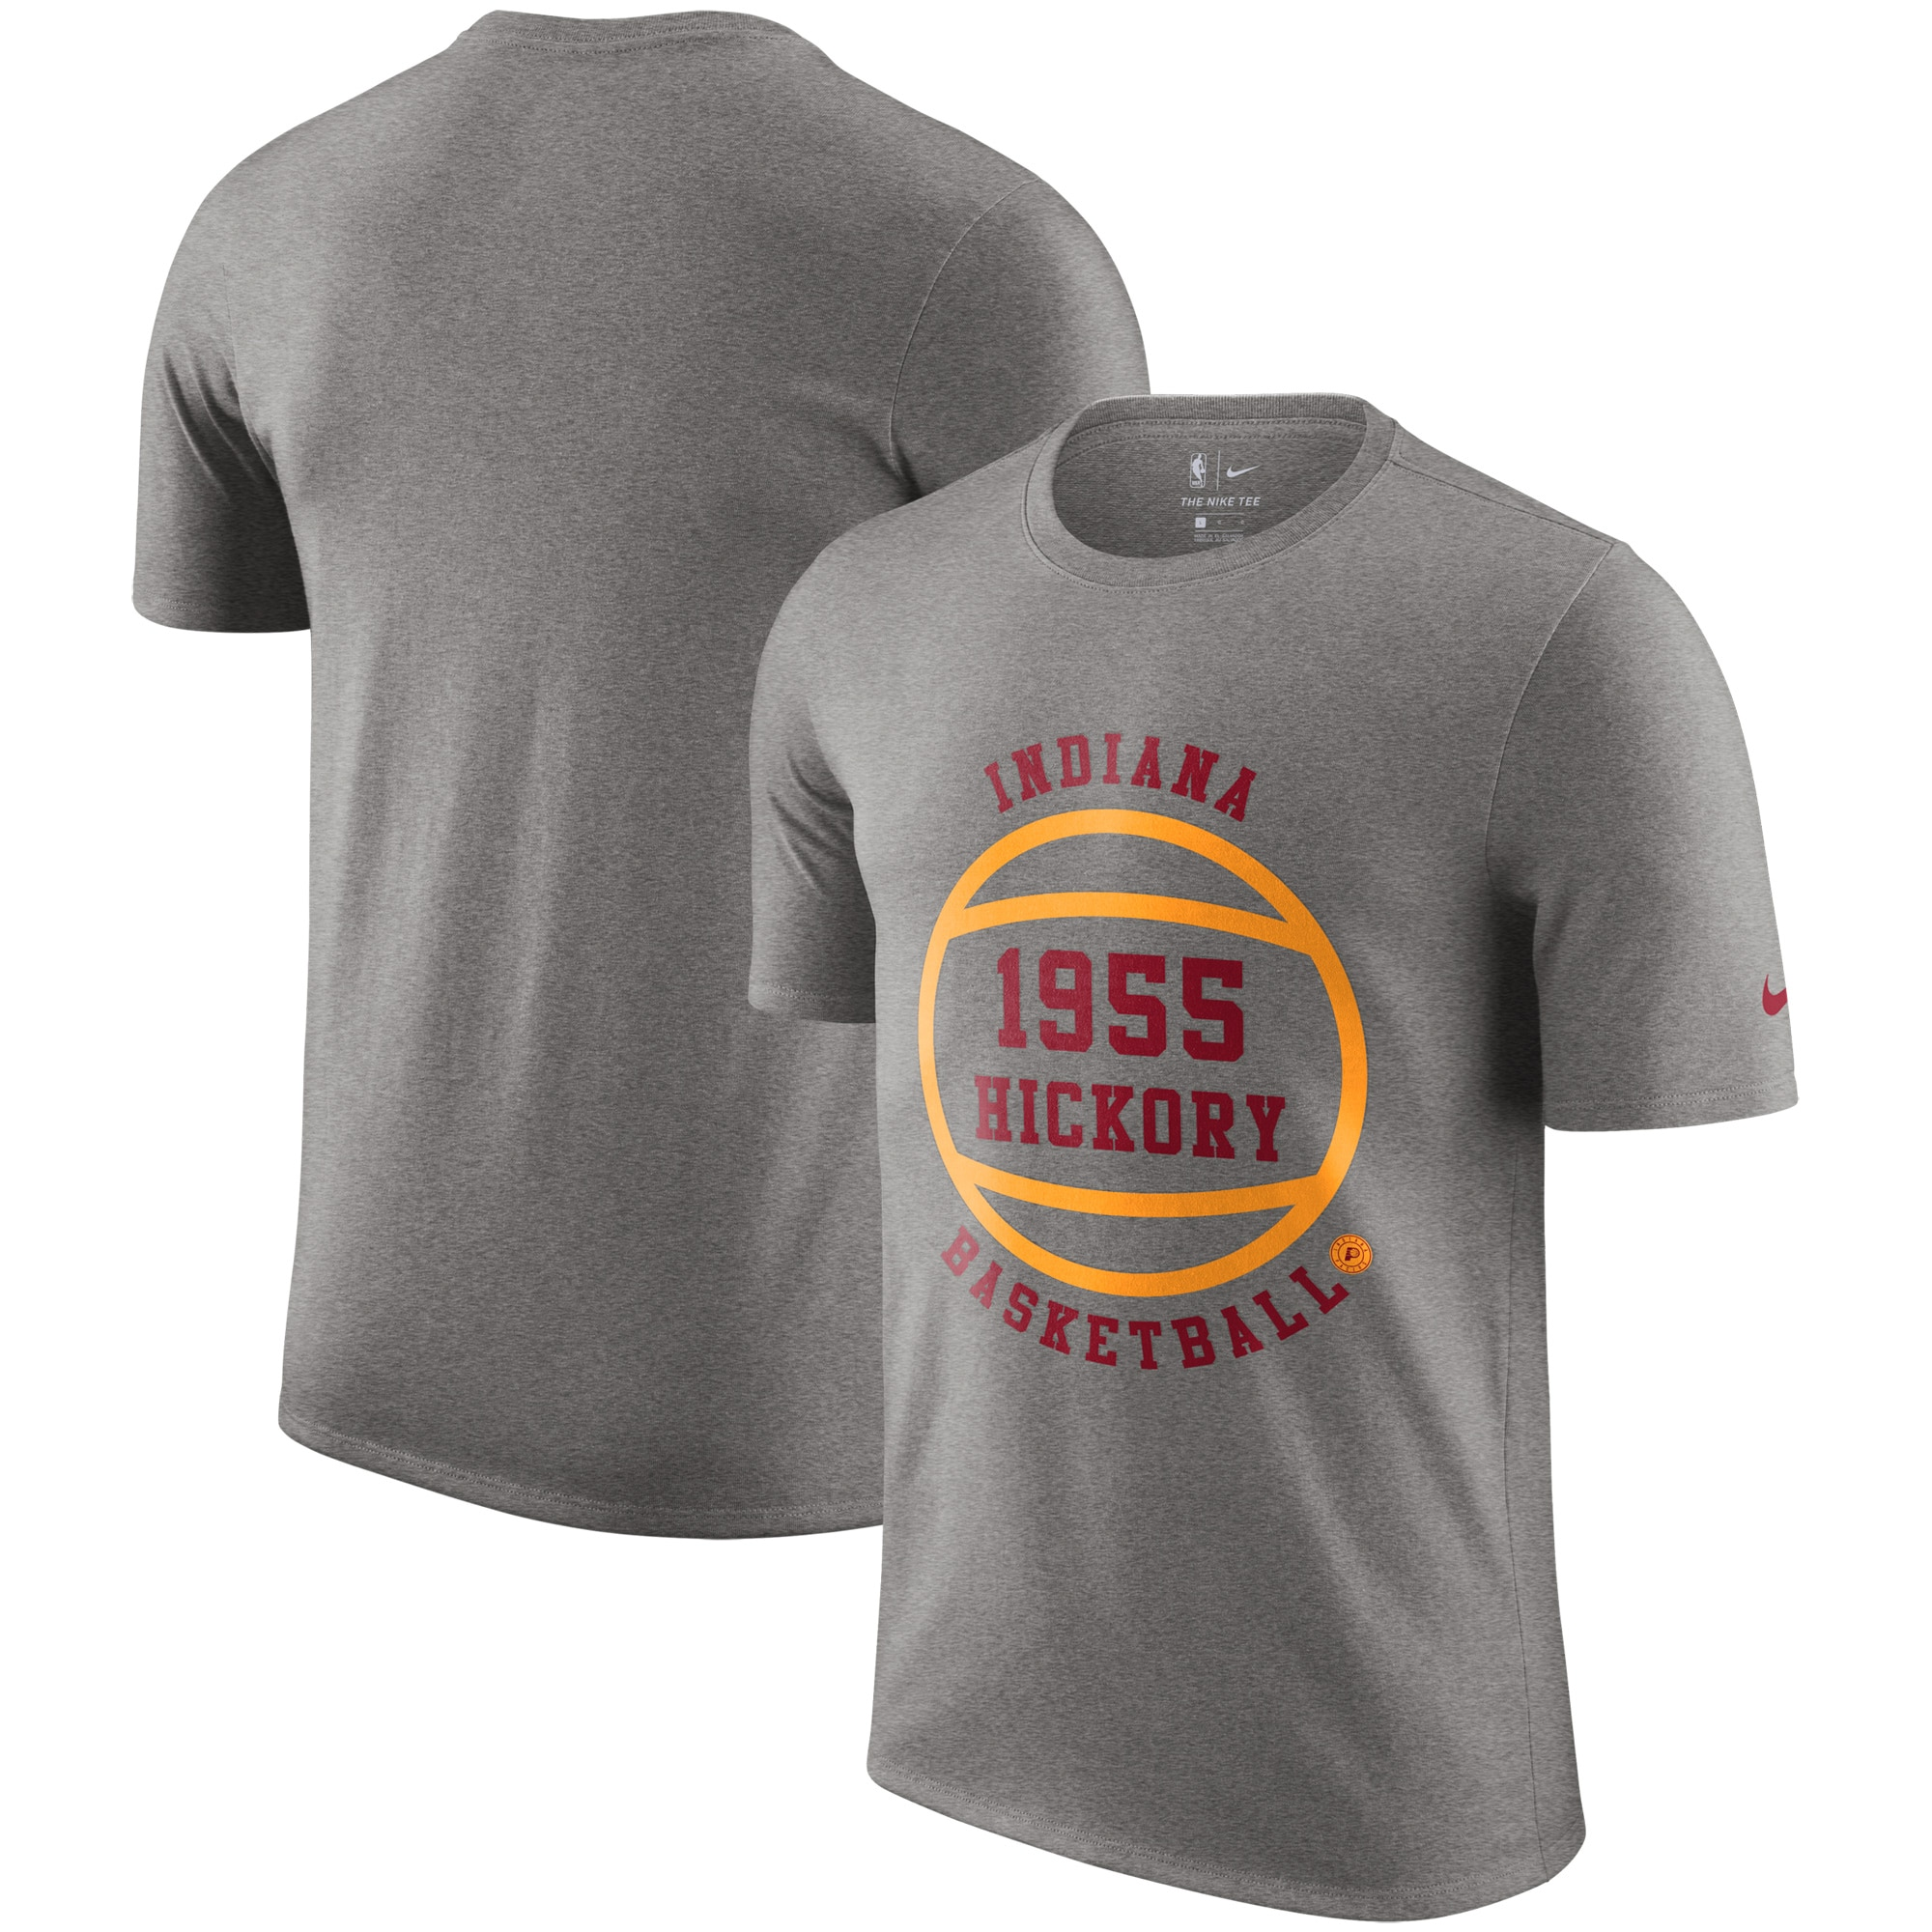 Indiana Pacers Nike Hardwood Classics Hometown Vintage T-Shirt - Heathered Gray